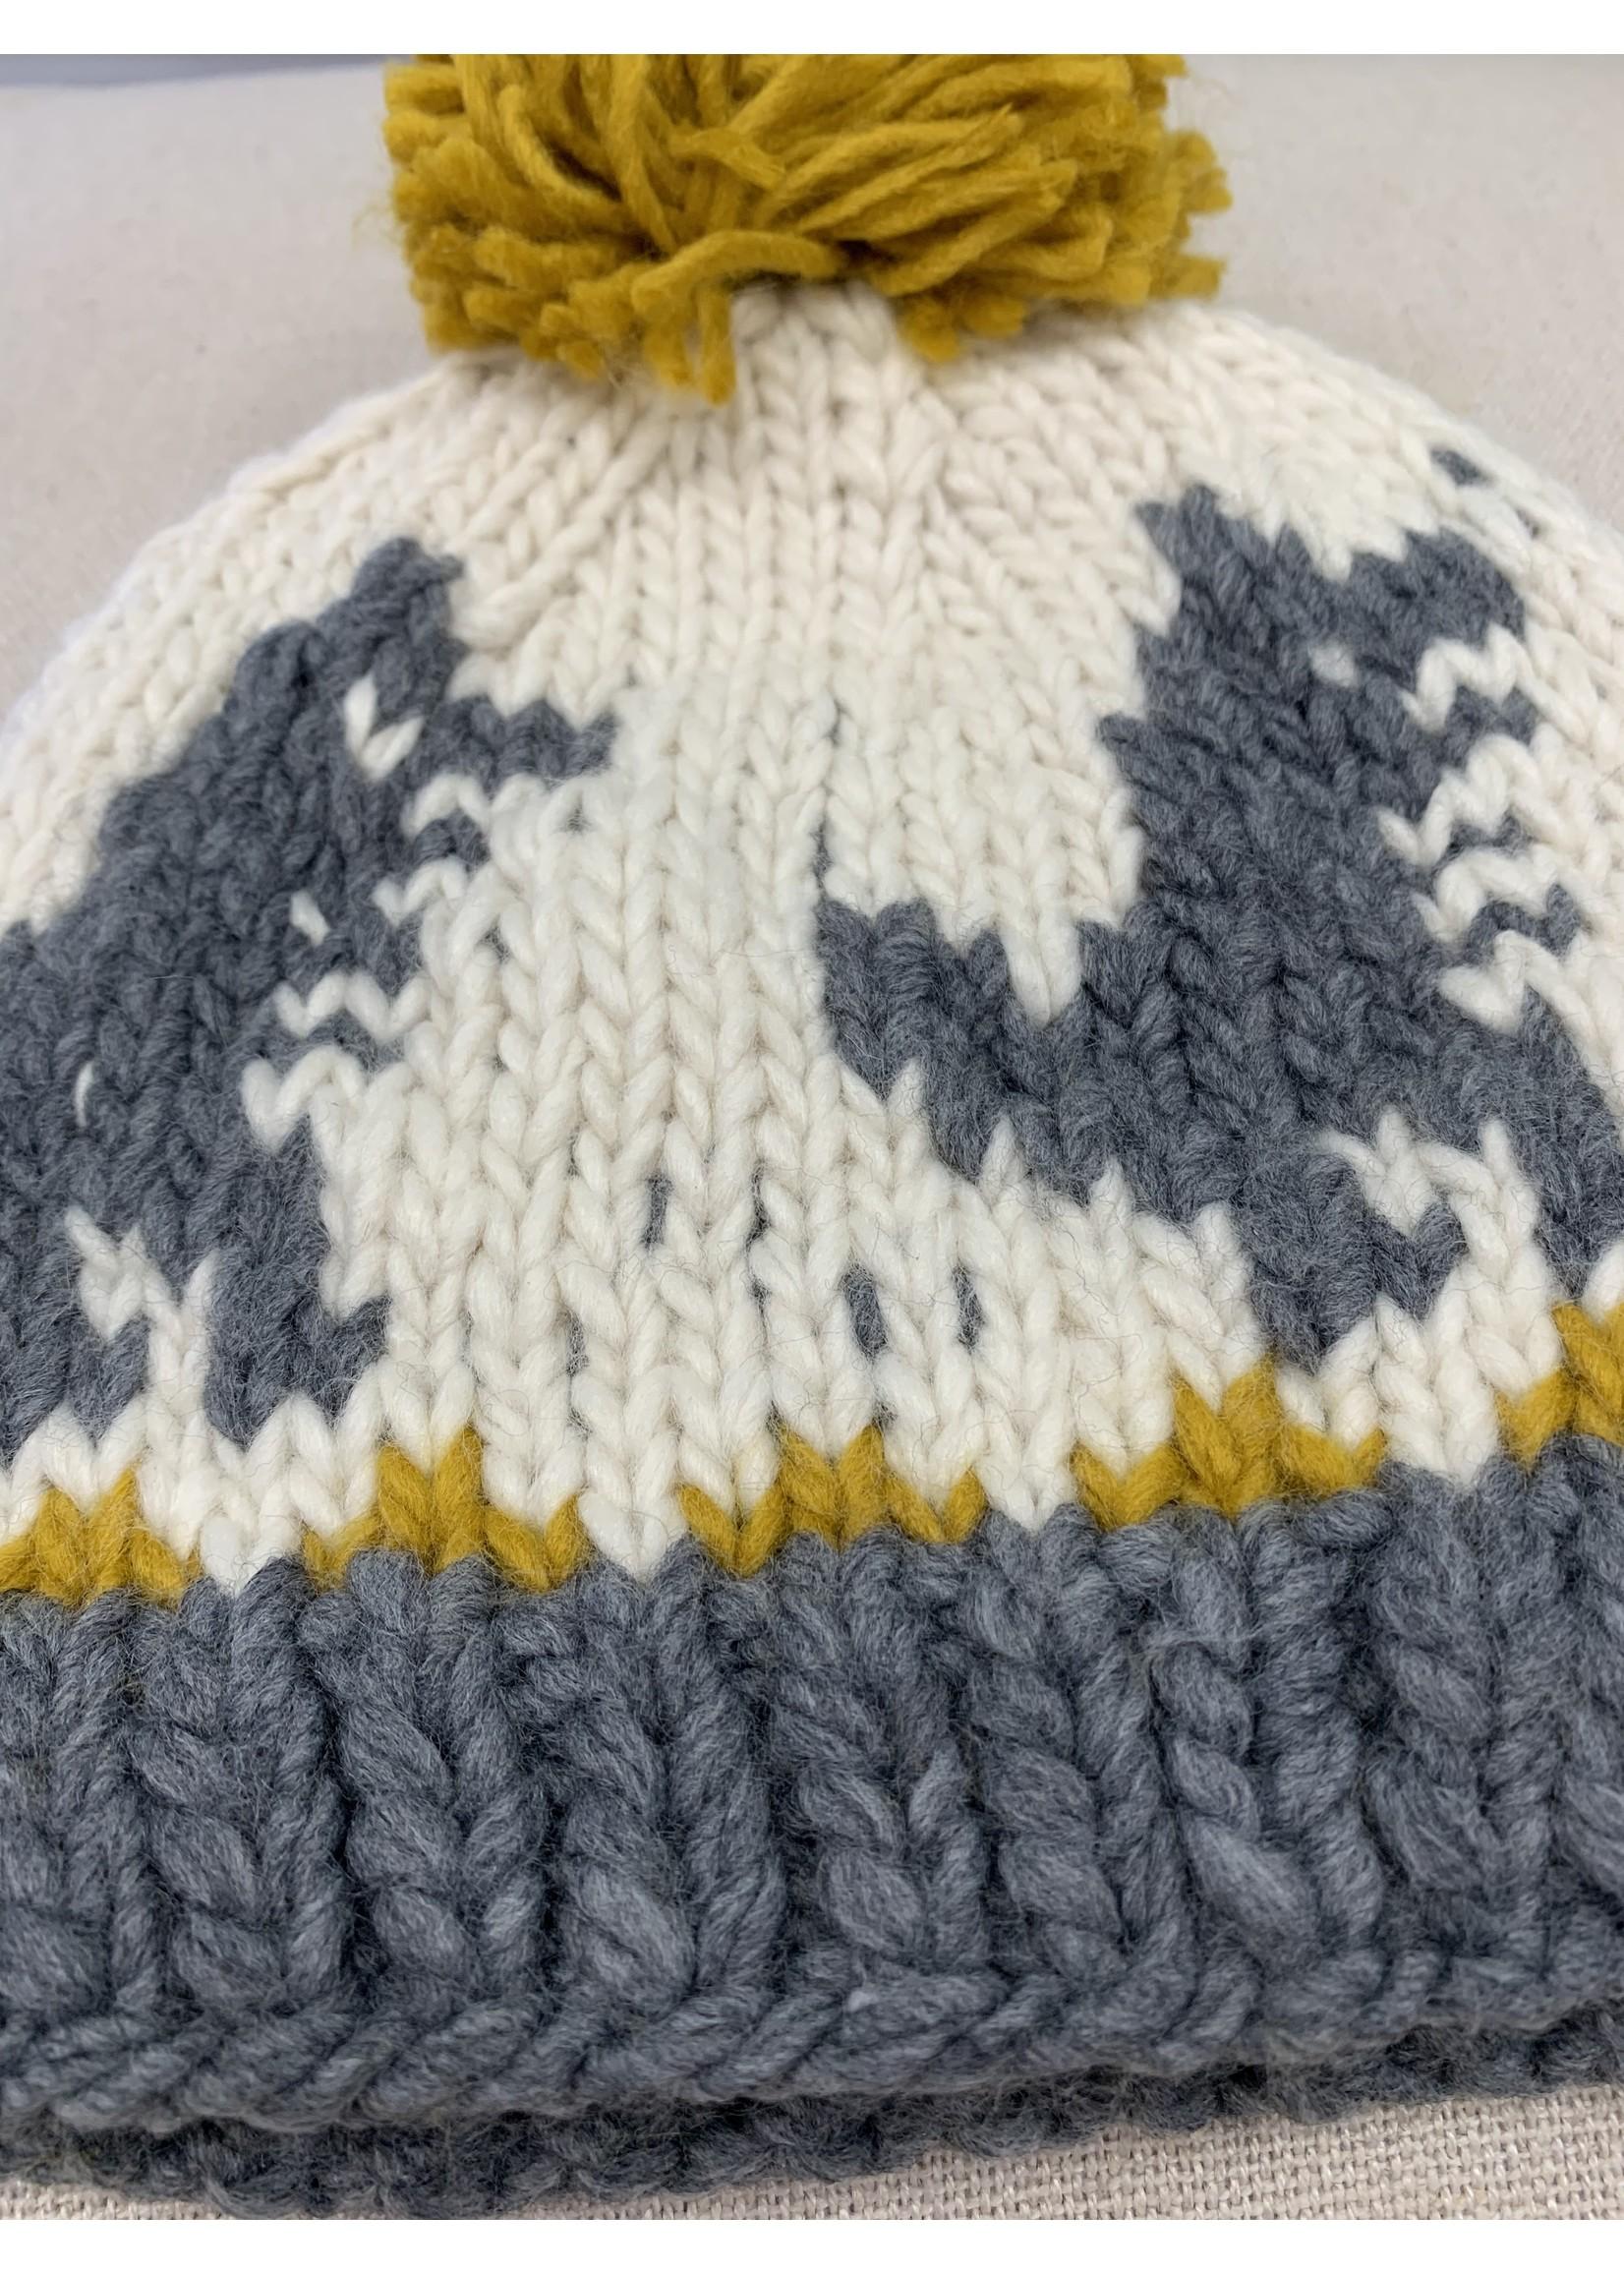 Huggalugs T-Rex Dinosaur Knit Hat